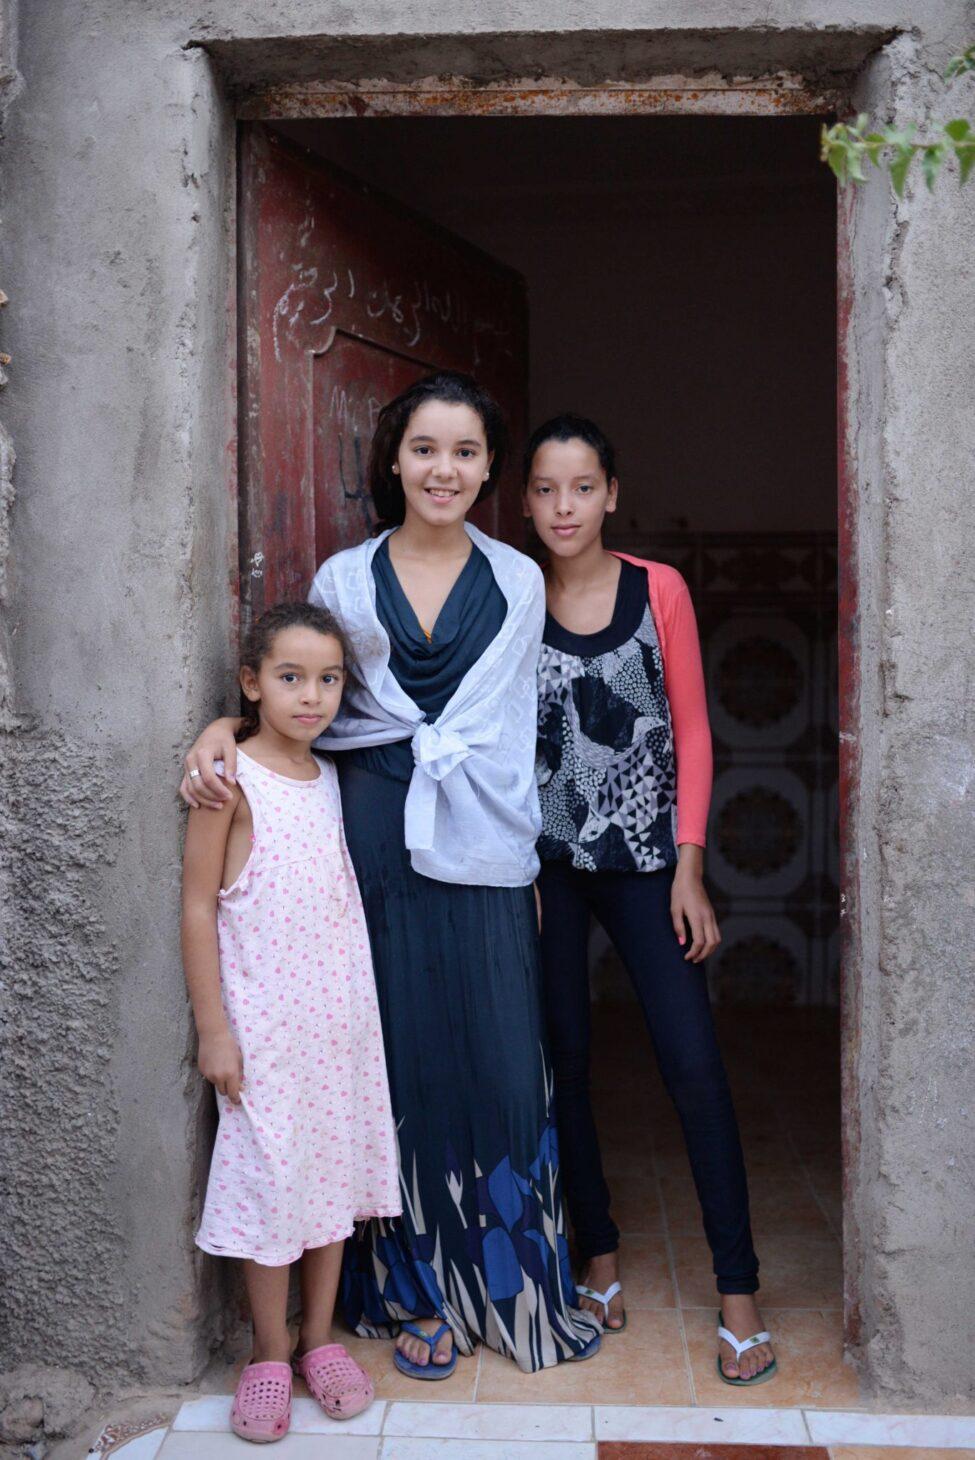 Sisters from Palmeraie